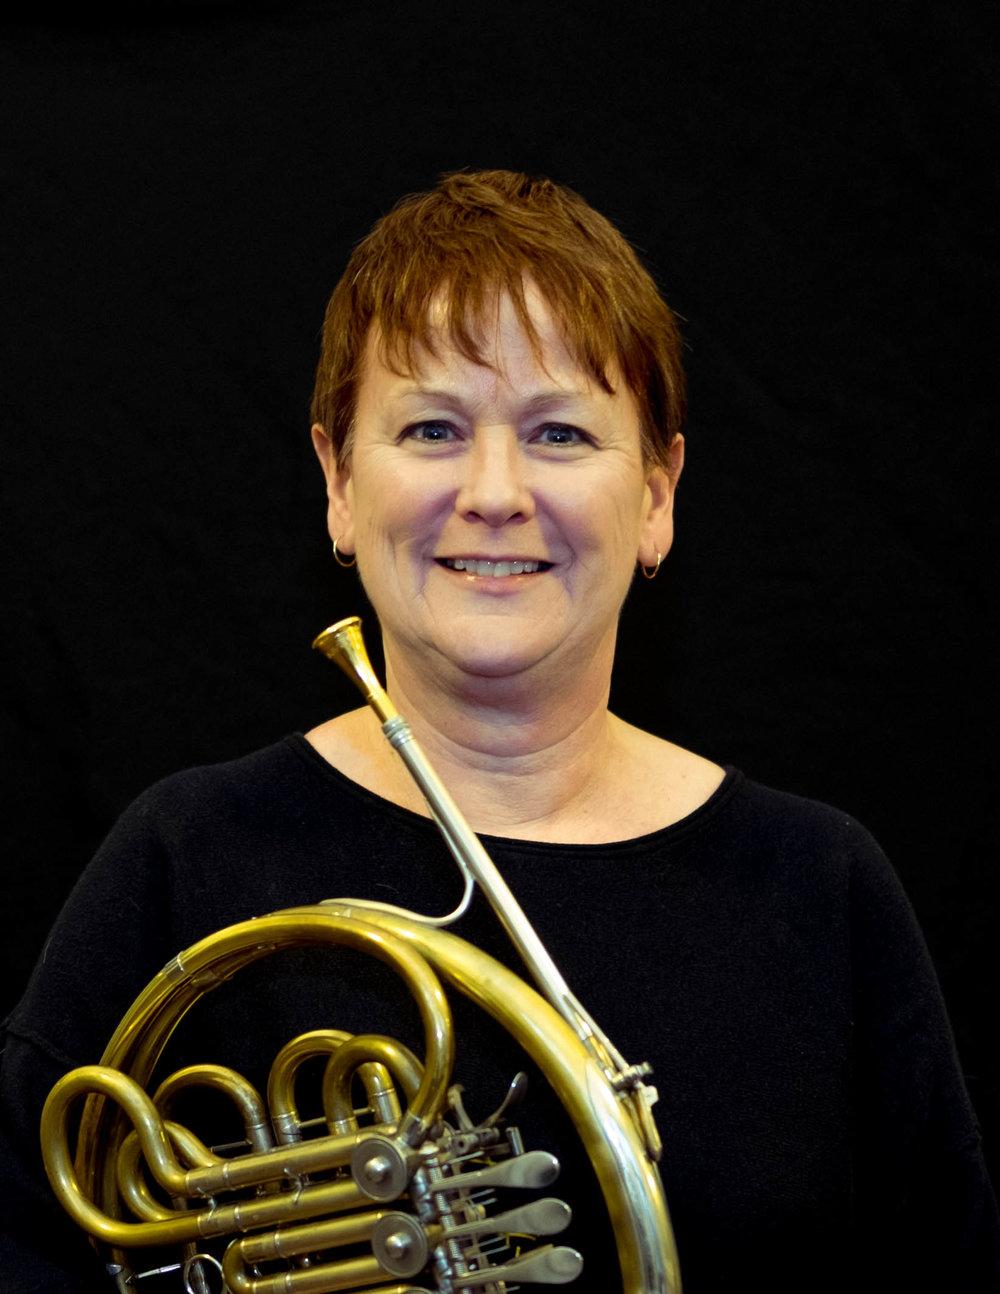 Kristin E. Olsen